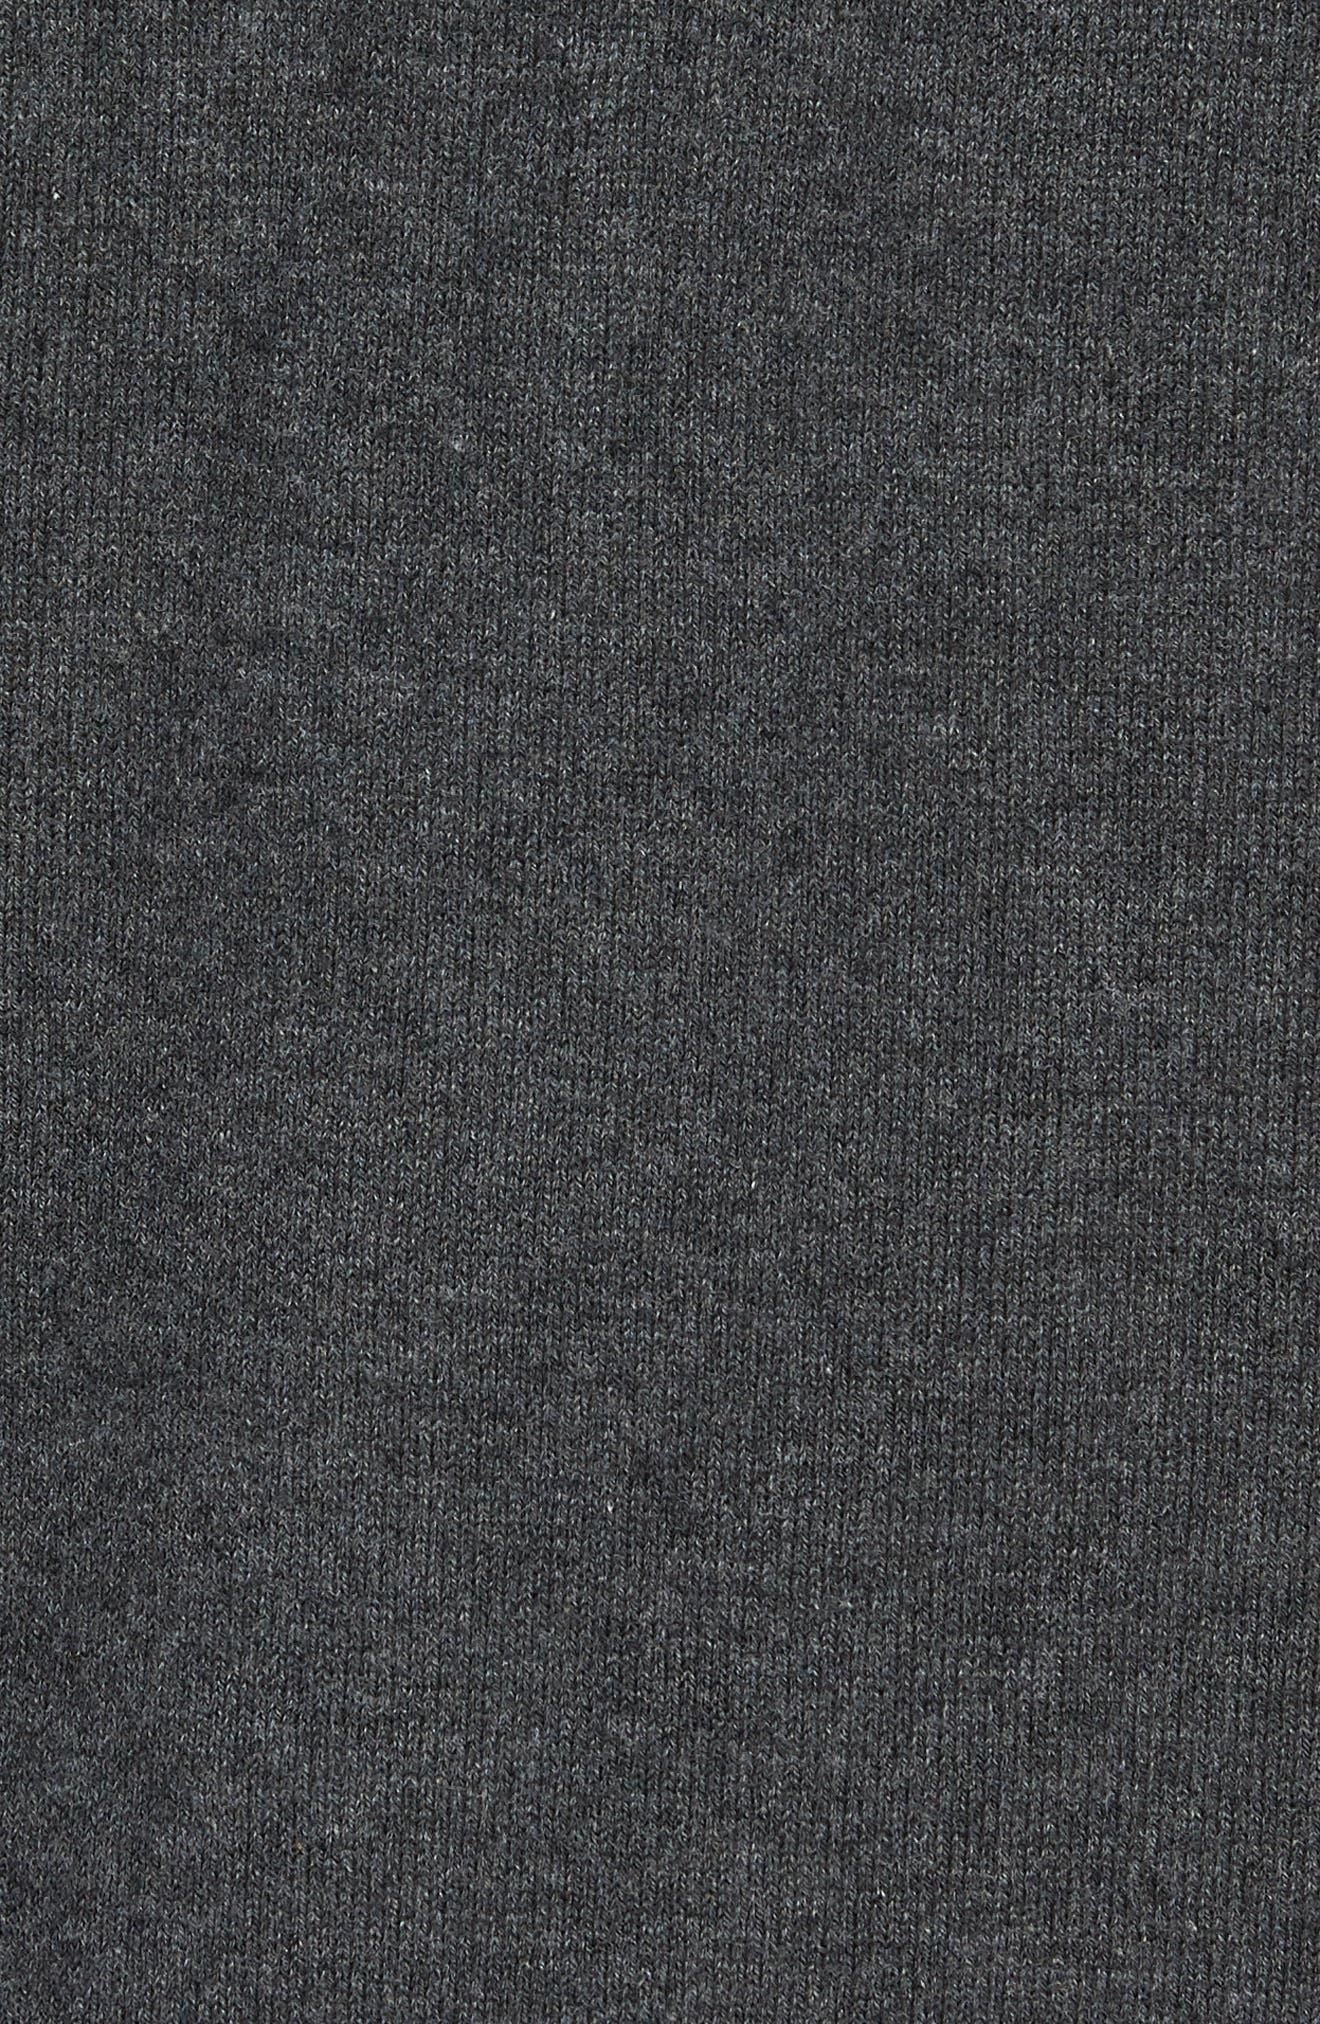 Tampa Bay Buccaneers - Lakemont Regular Fit Quarter Zip Sweater,                             Alternate thumbnail 5, color,                             CHARCOAL HEATHER